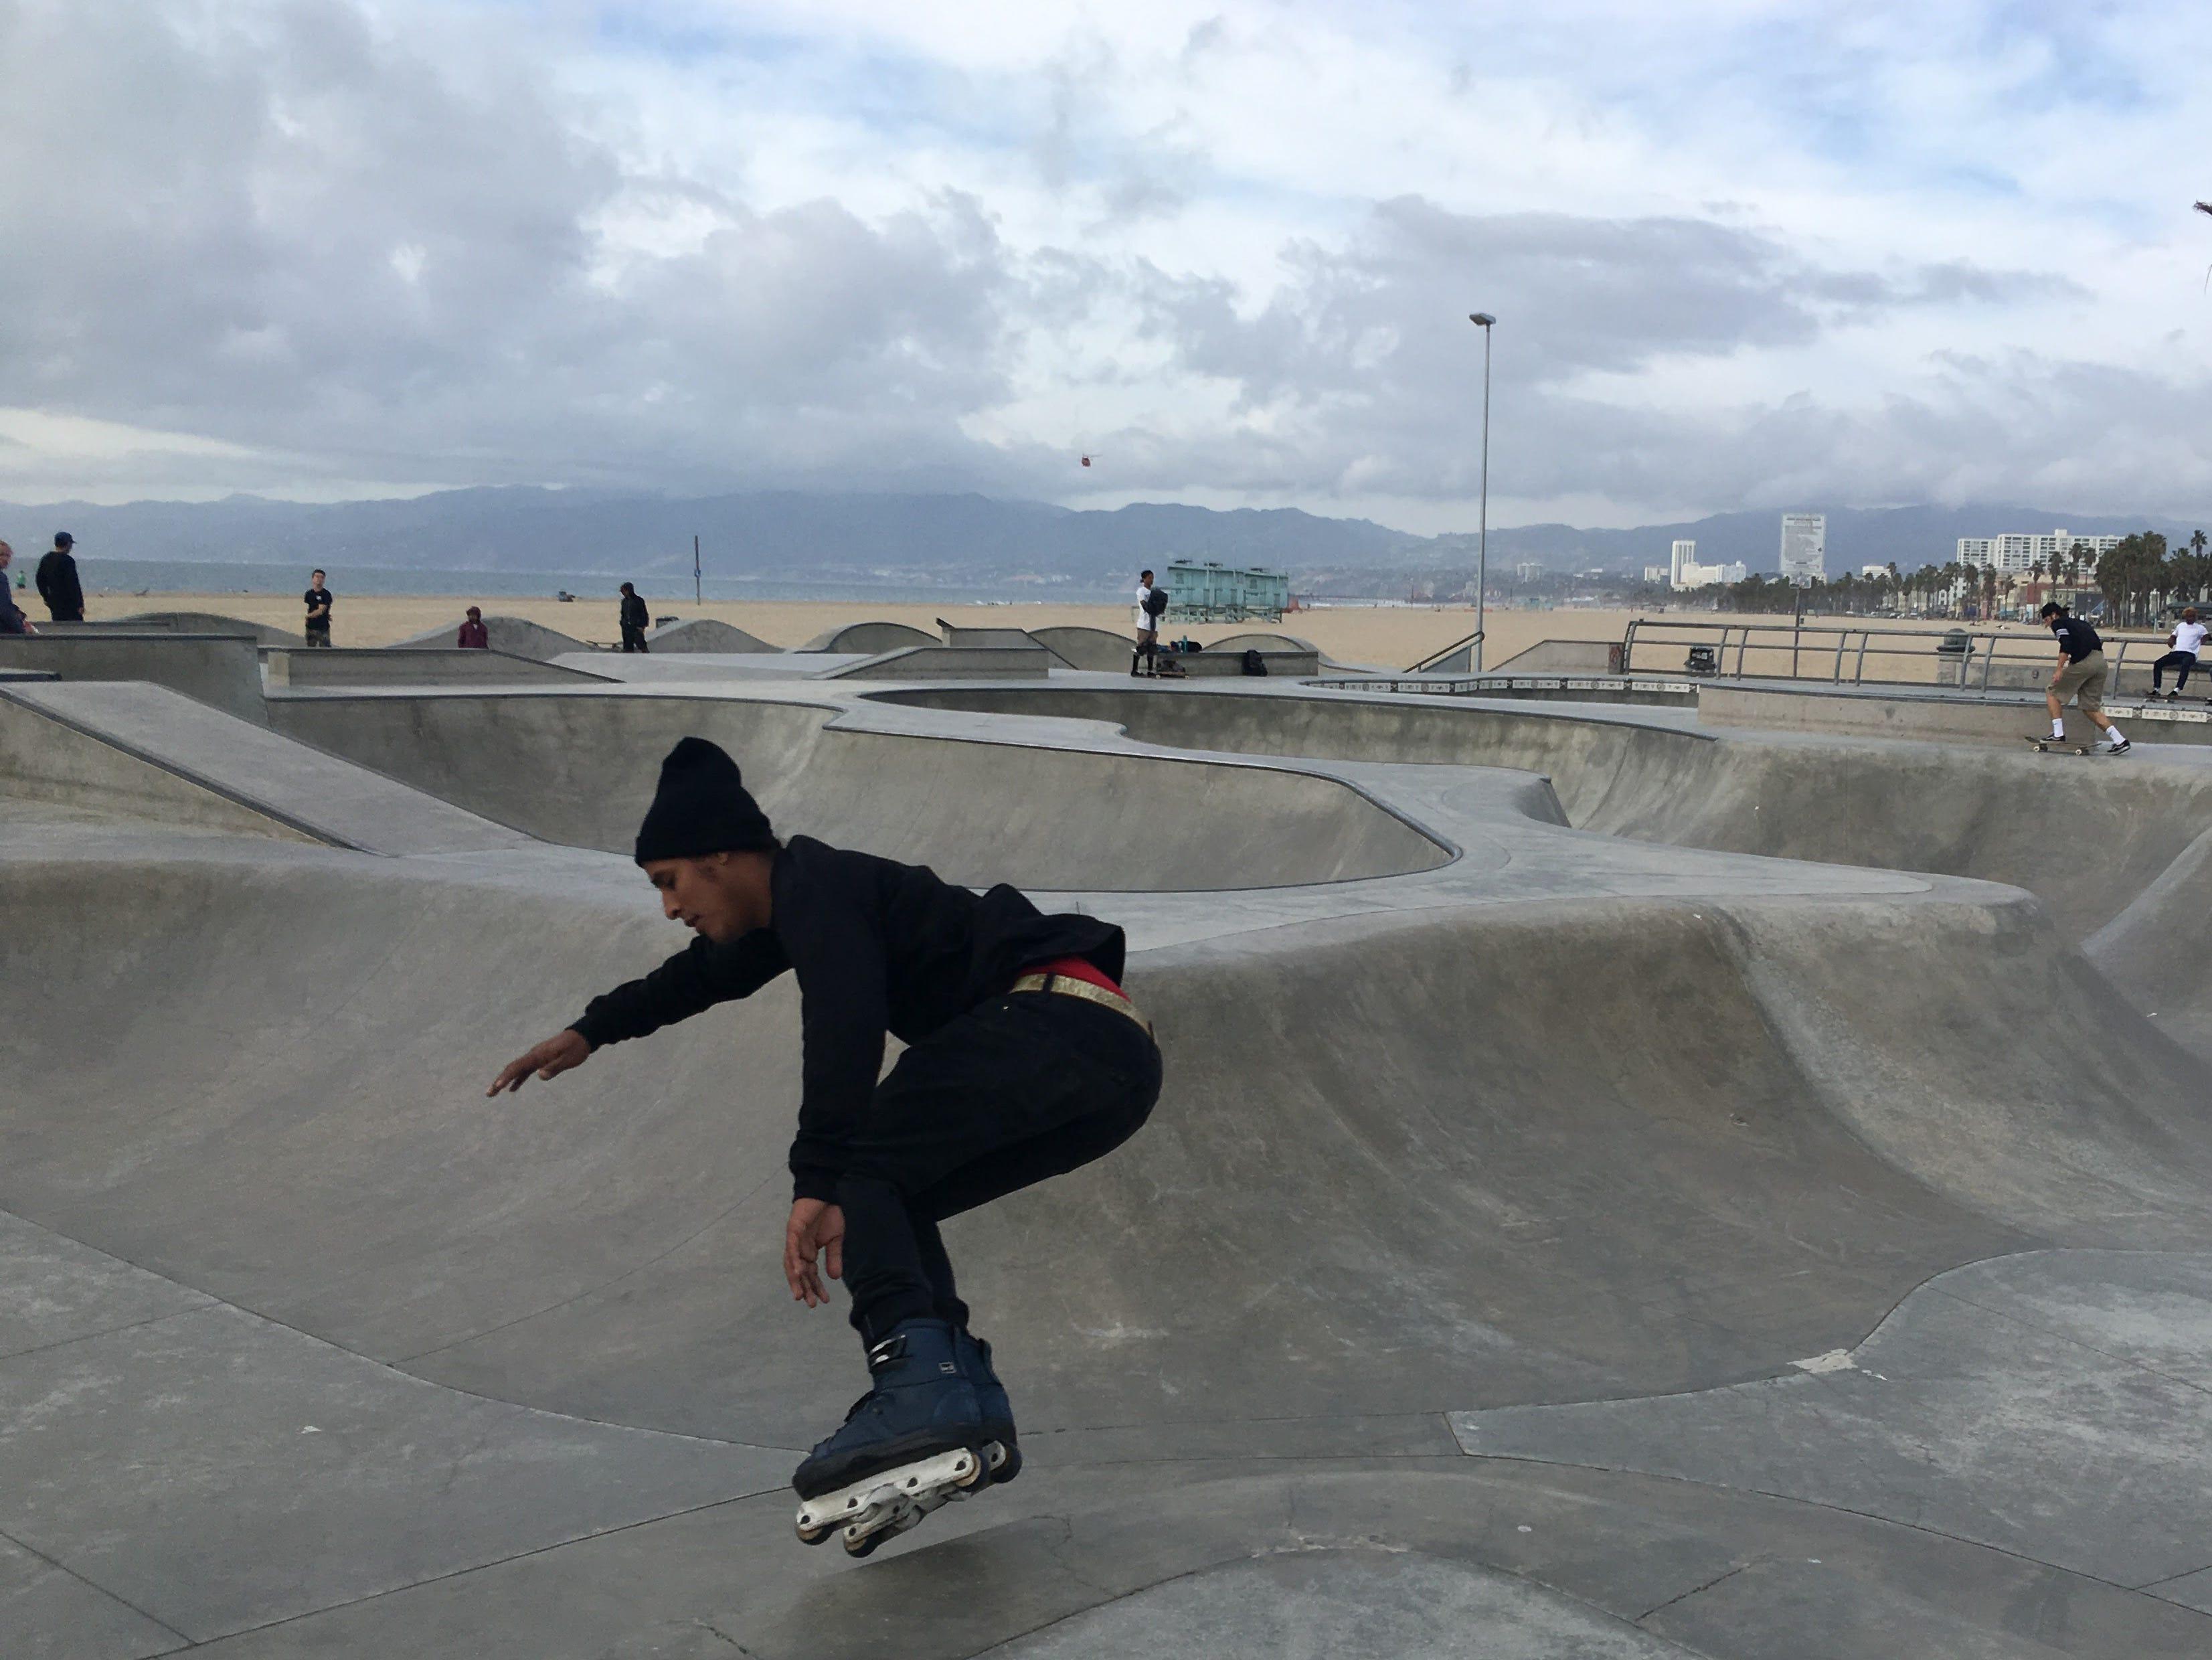 The Venice Beach skate park is a popular spot